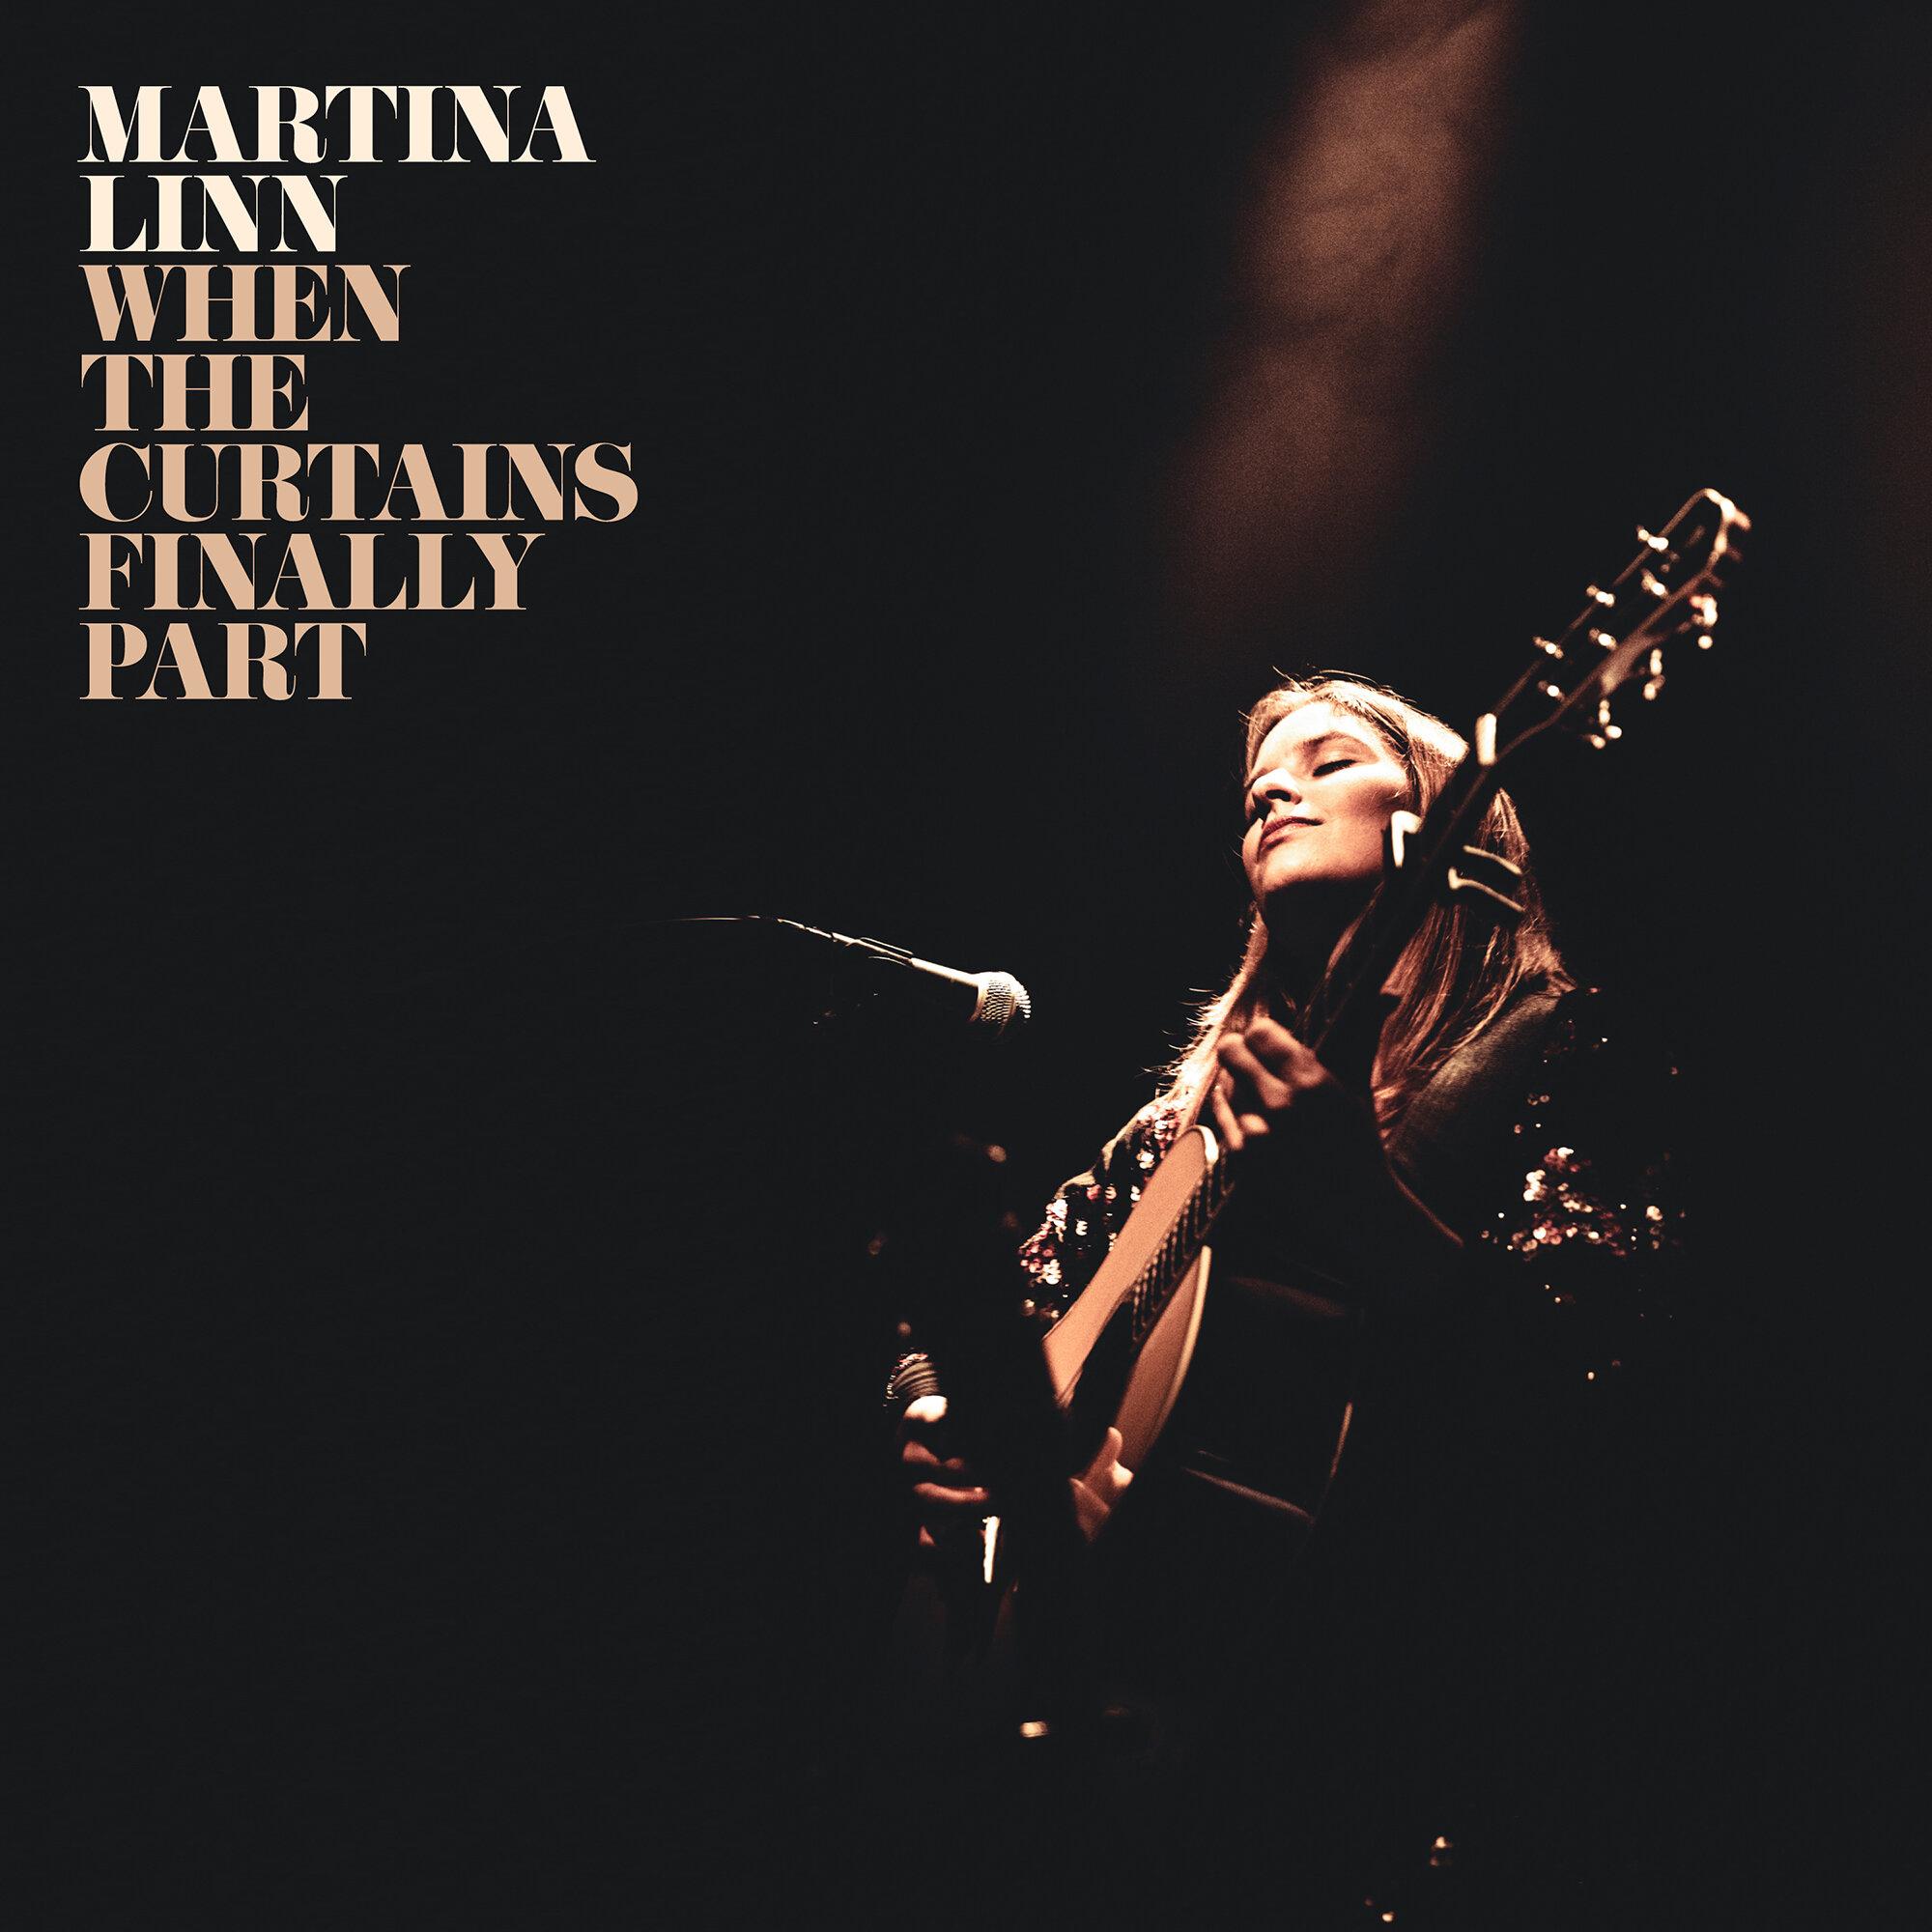 Martina-Linn_When-The-Curtains-Finally-Part_2000px.jpg